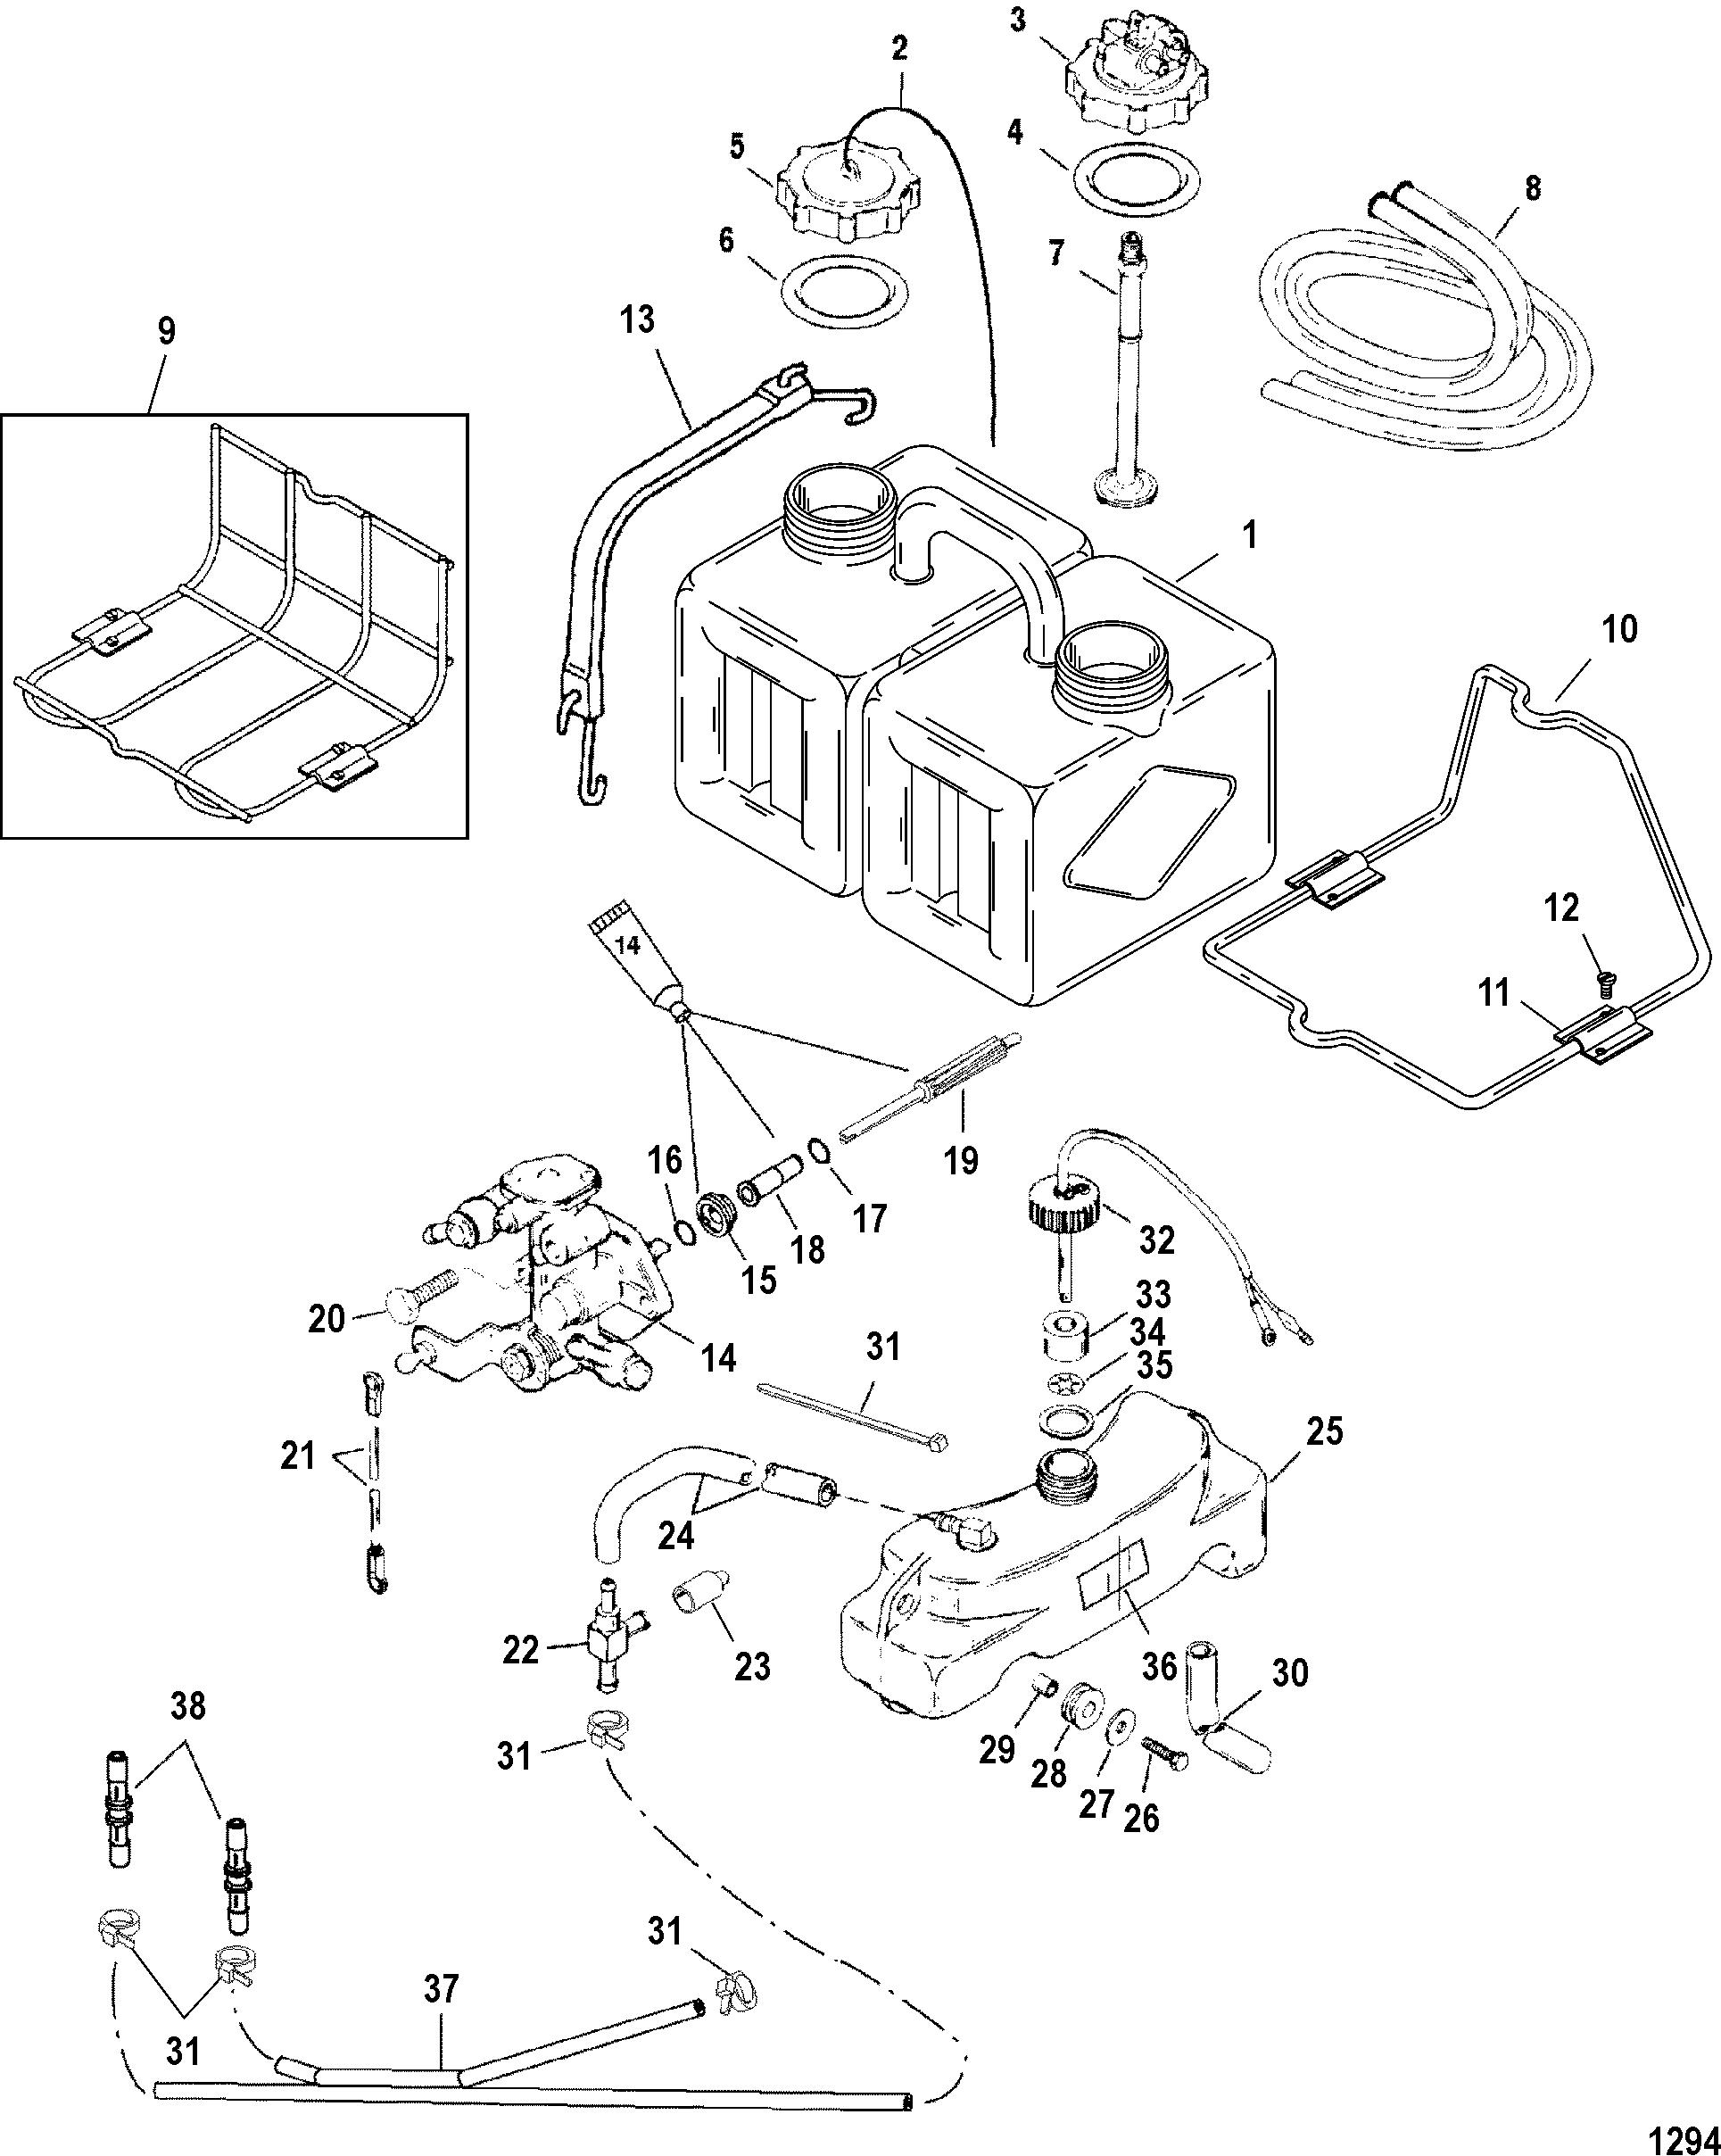 oil injection components for mariner mercury 135 140 150. Black Bedroom Furniture Sets. Home Design Ideas